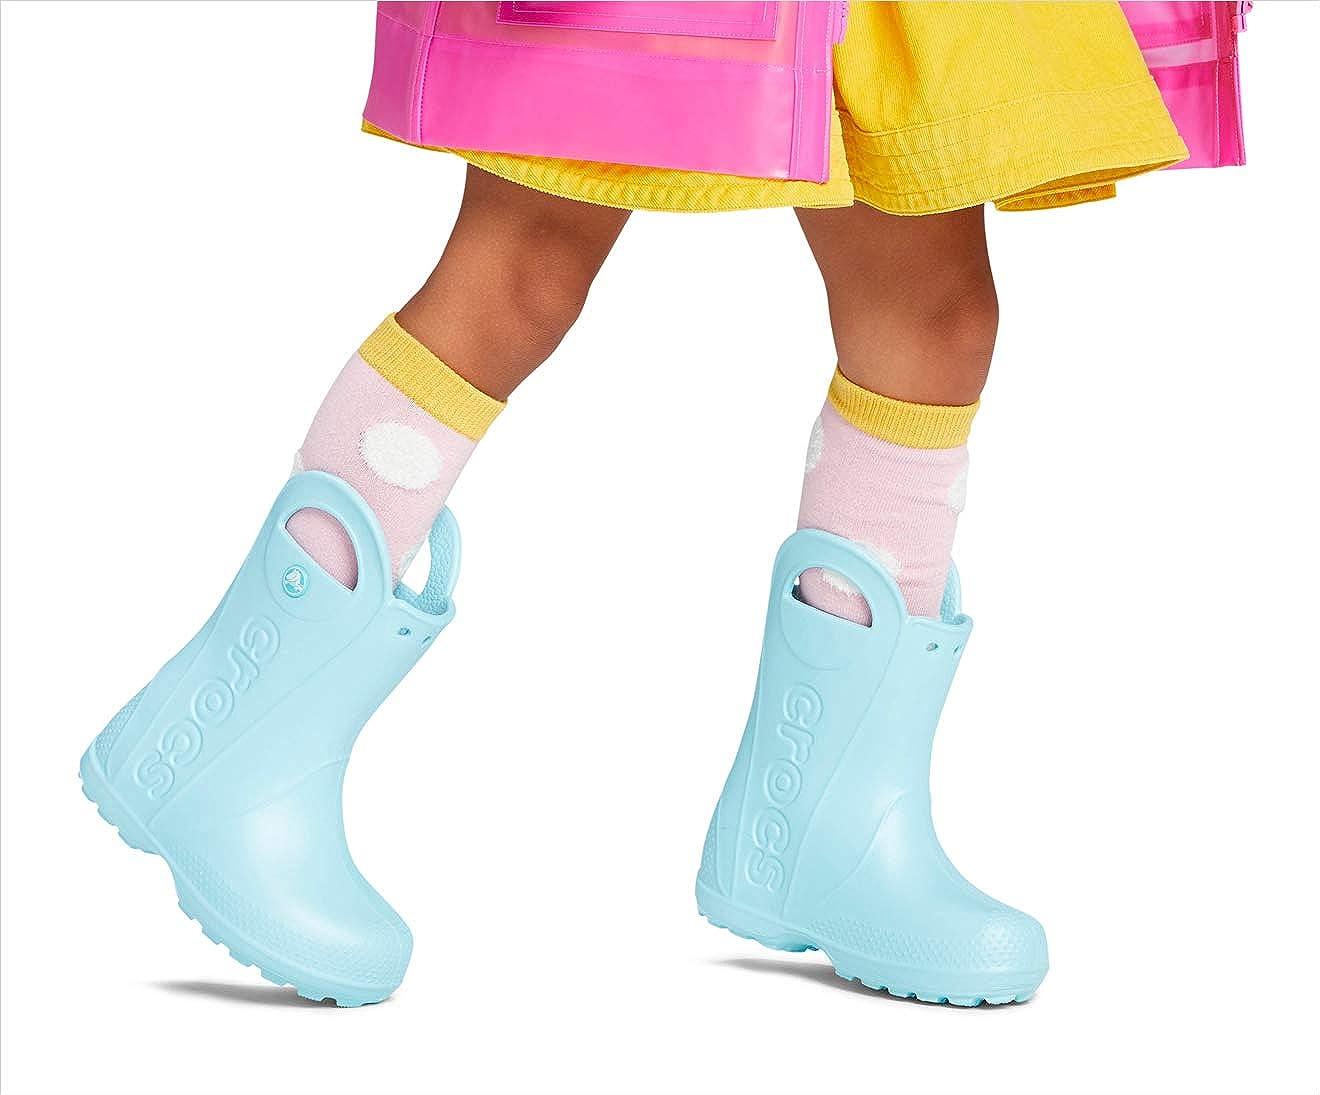 Crocs Unisex-Child Handle It Rain Boot Rain Shoe